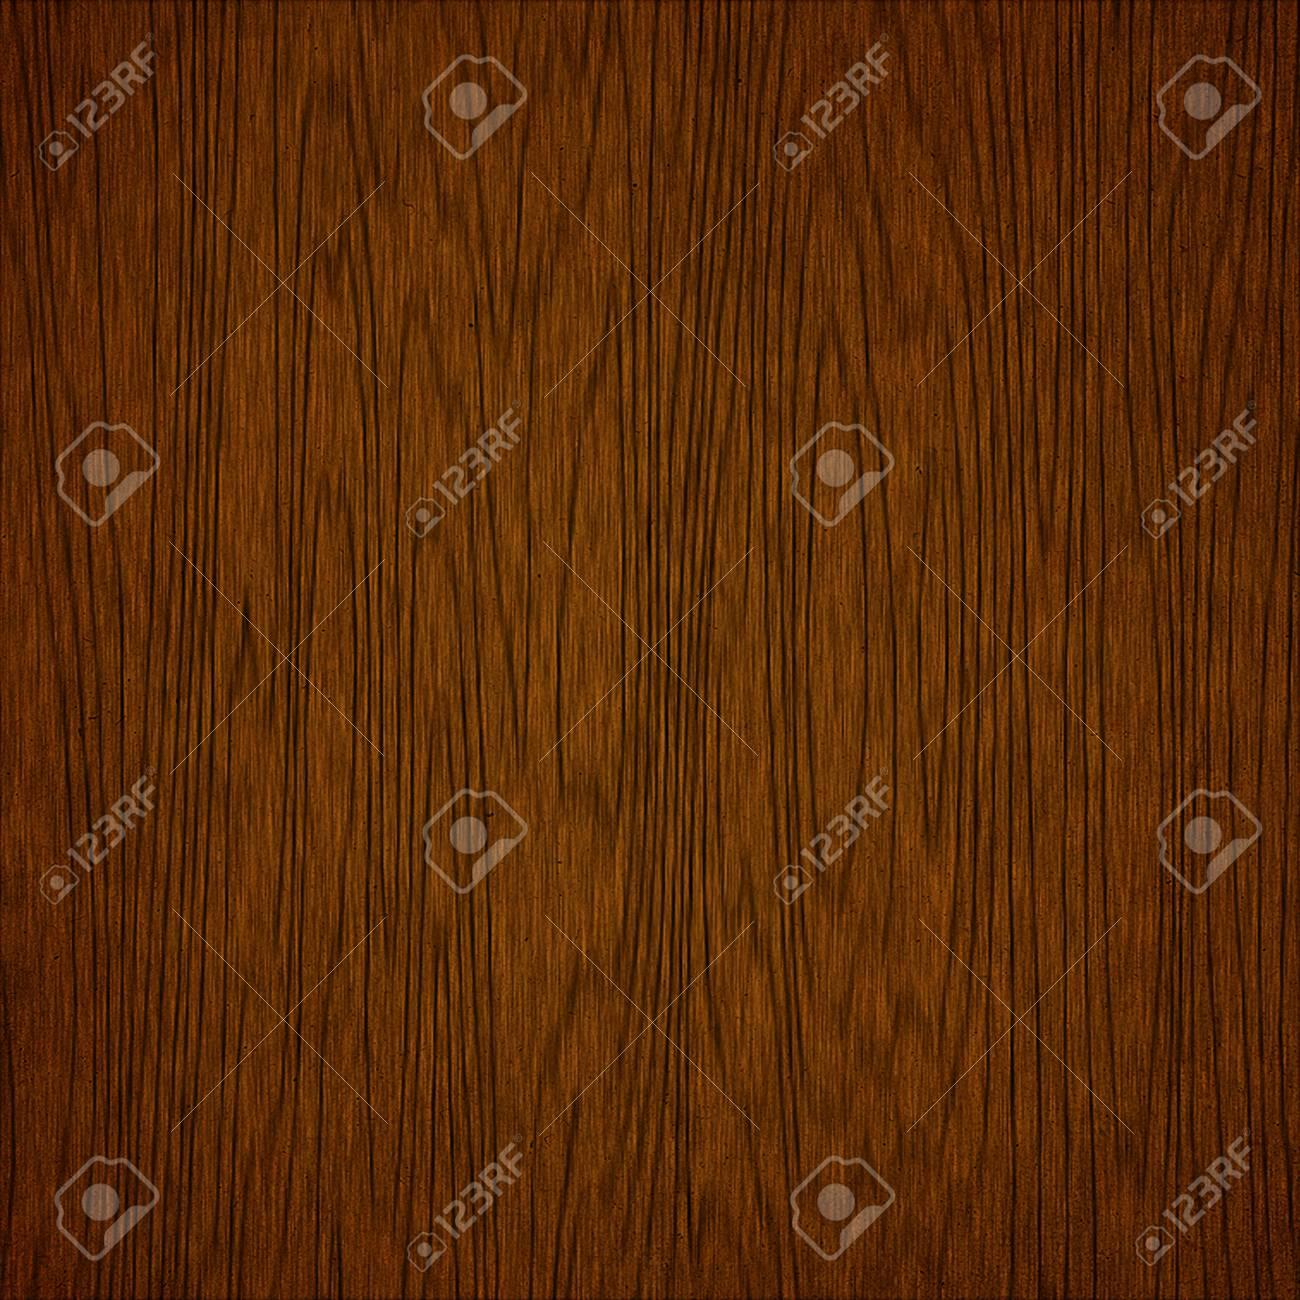 grunge wood texture background Stock Photo - 12696869